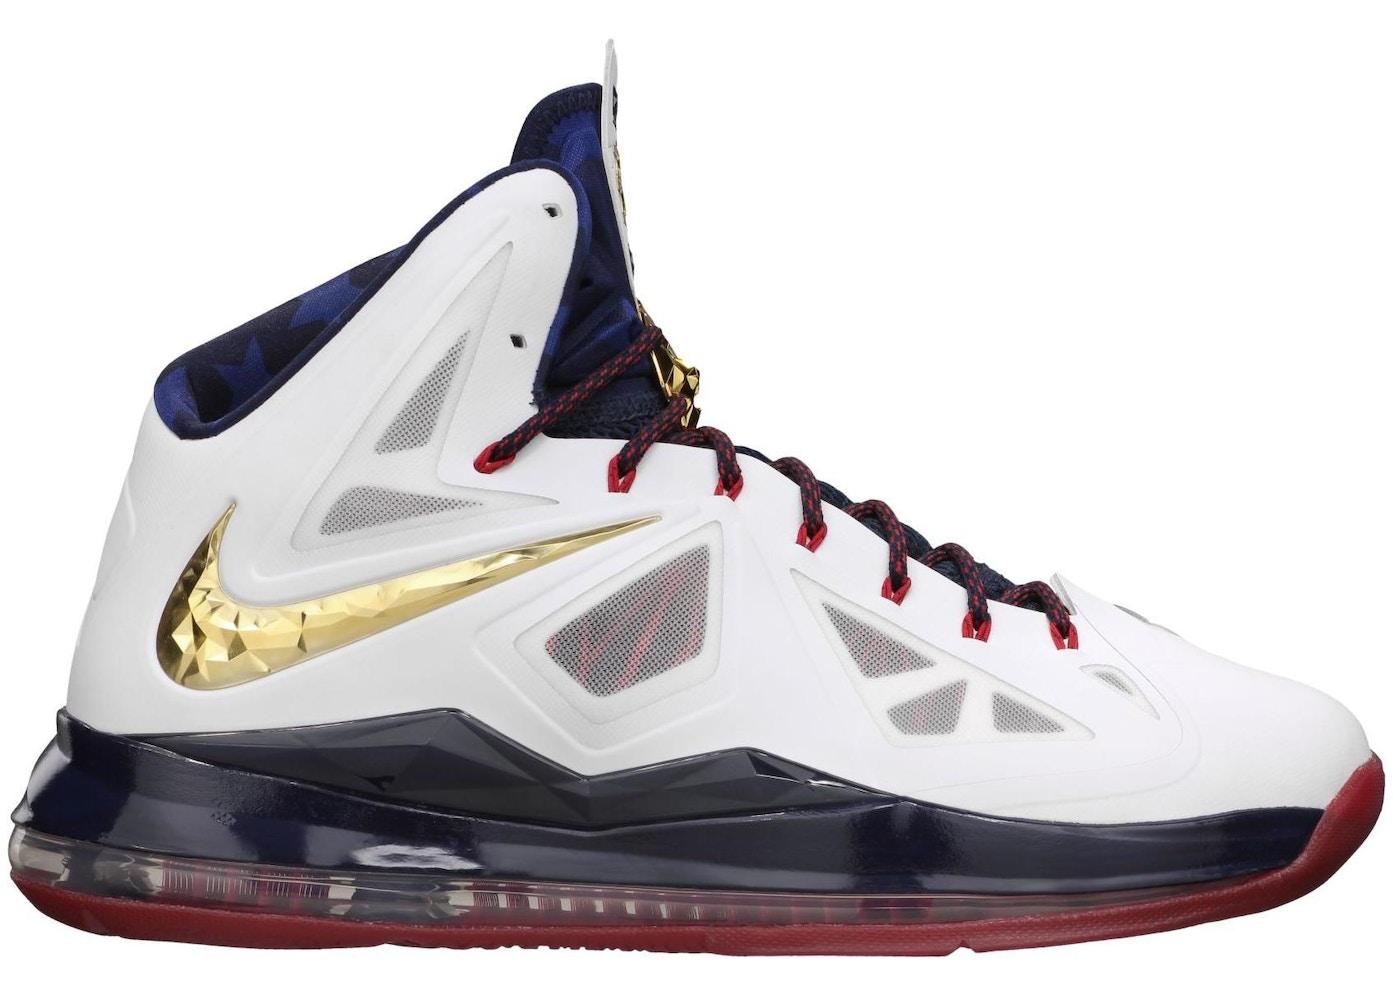 Nike LeBron 10 Shoes - Average Sale Price d8251a134